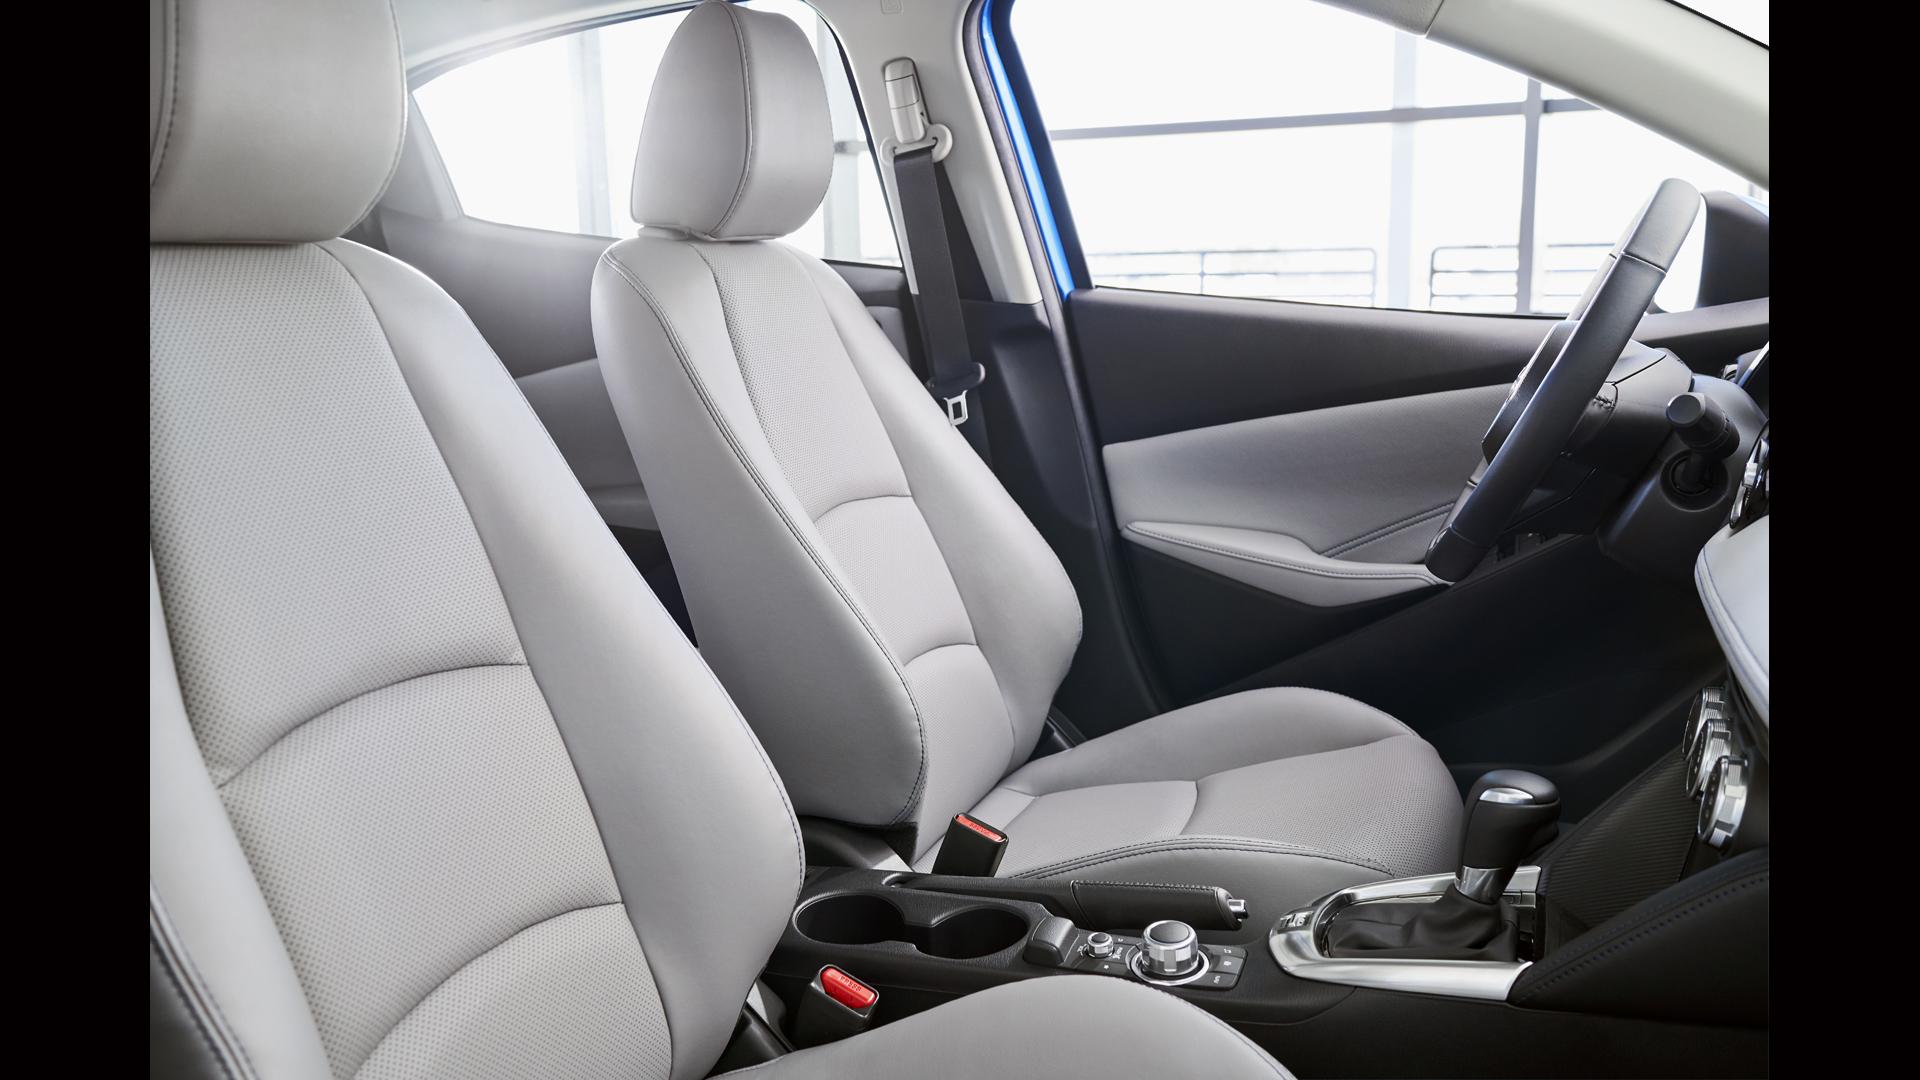 2020-toyota-yaris-hatchback ic gorunum